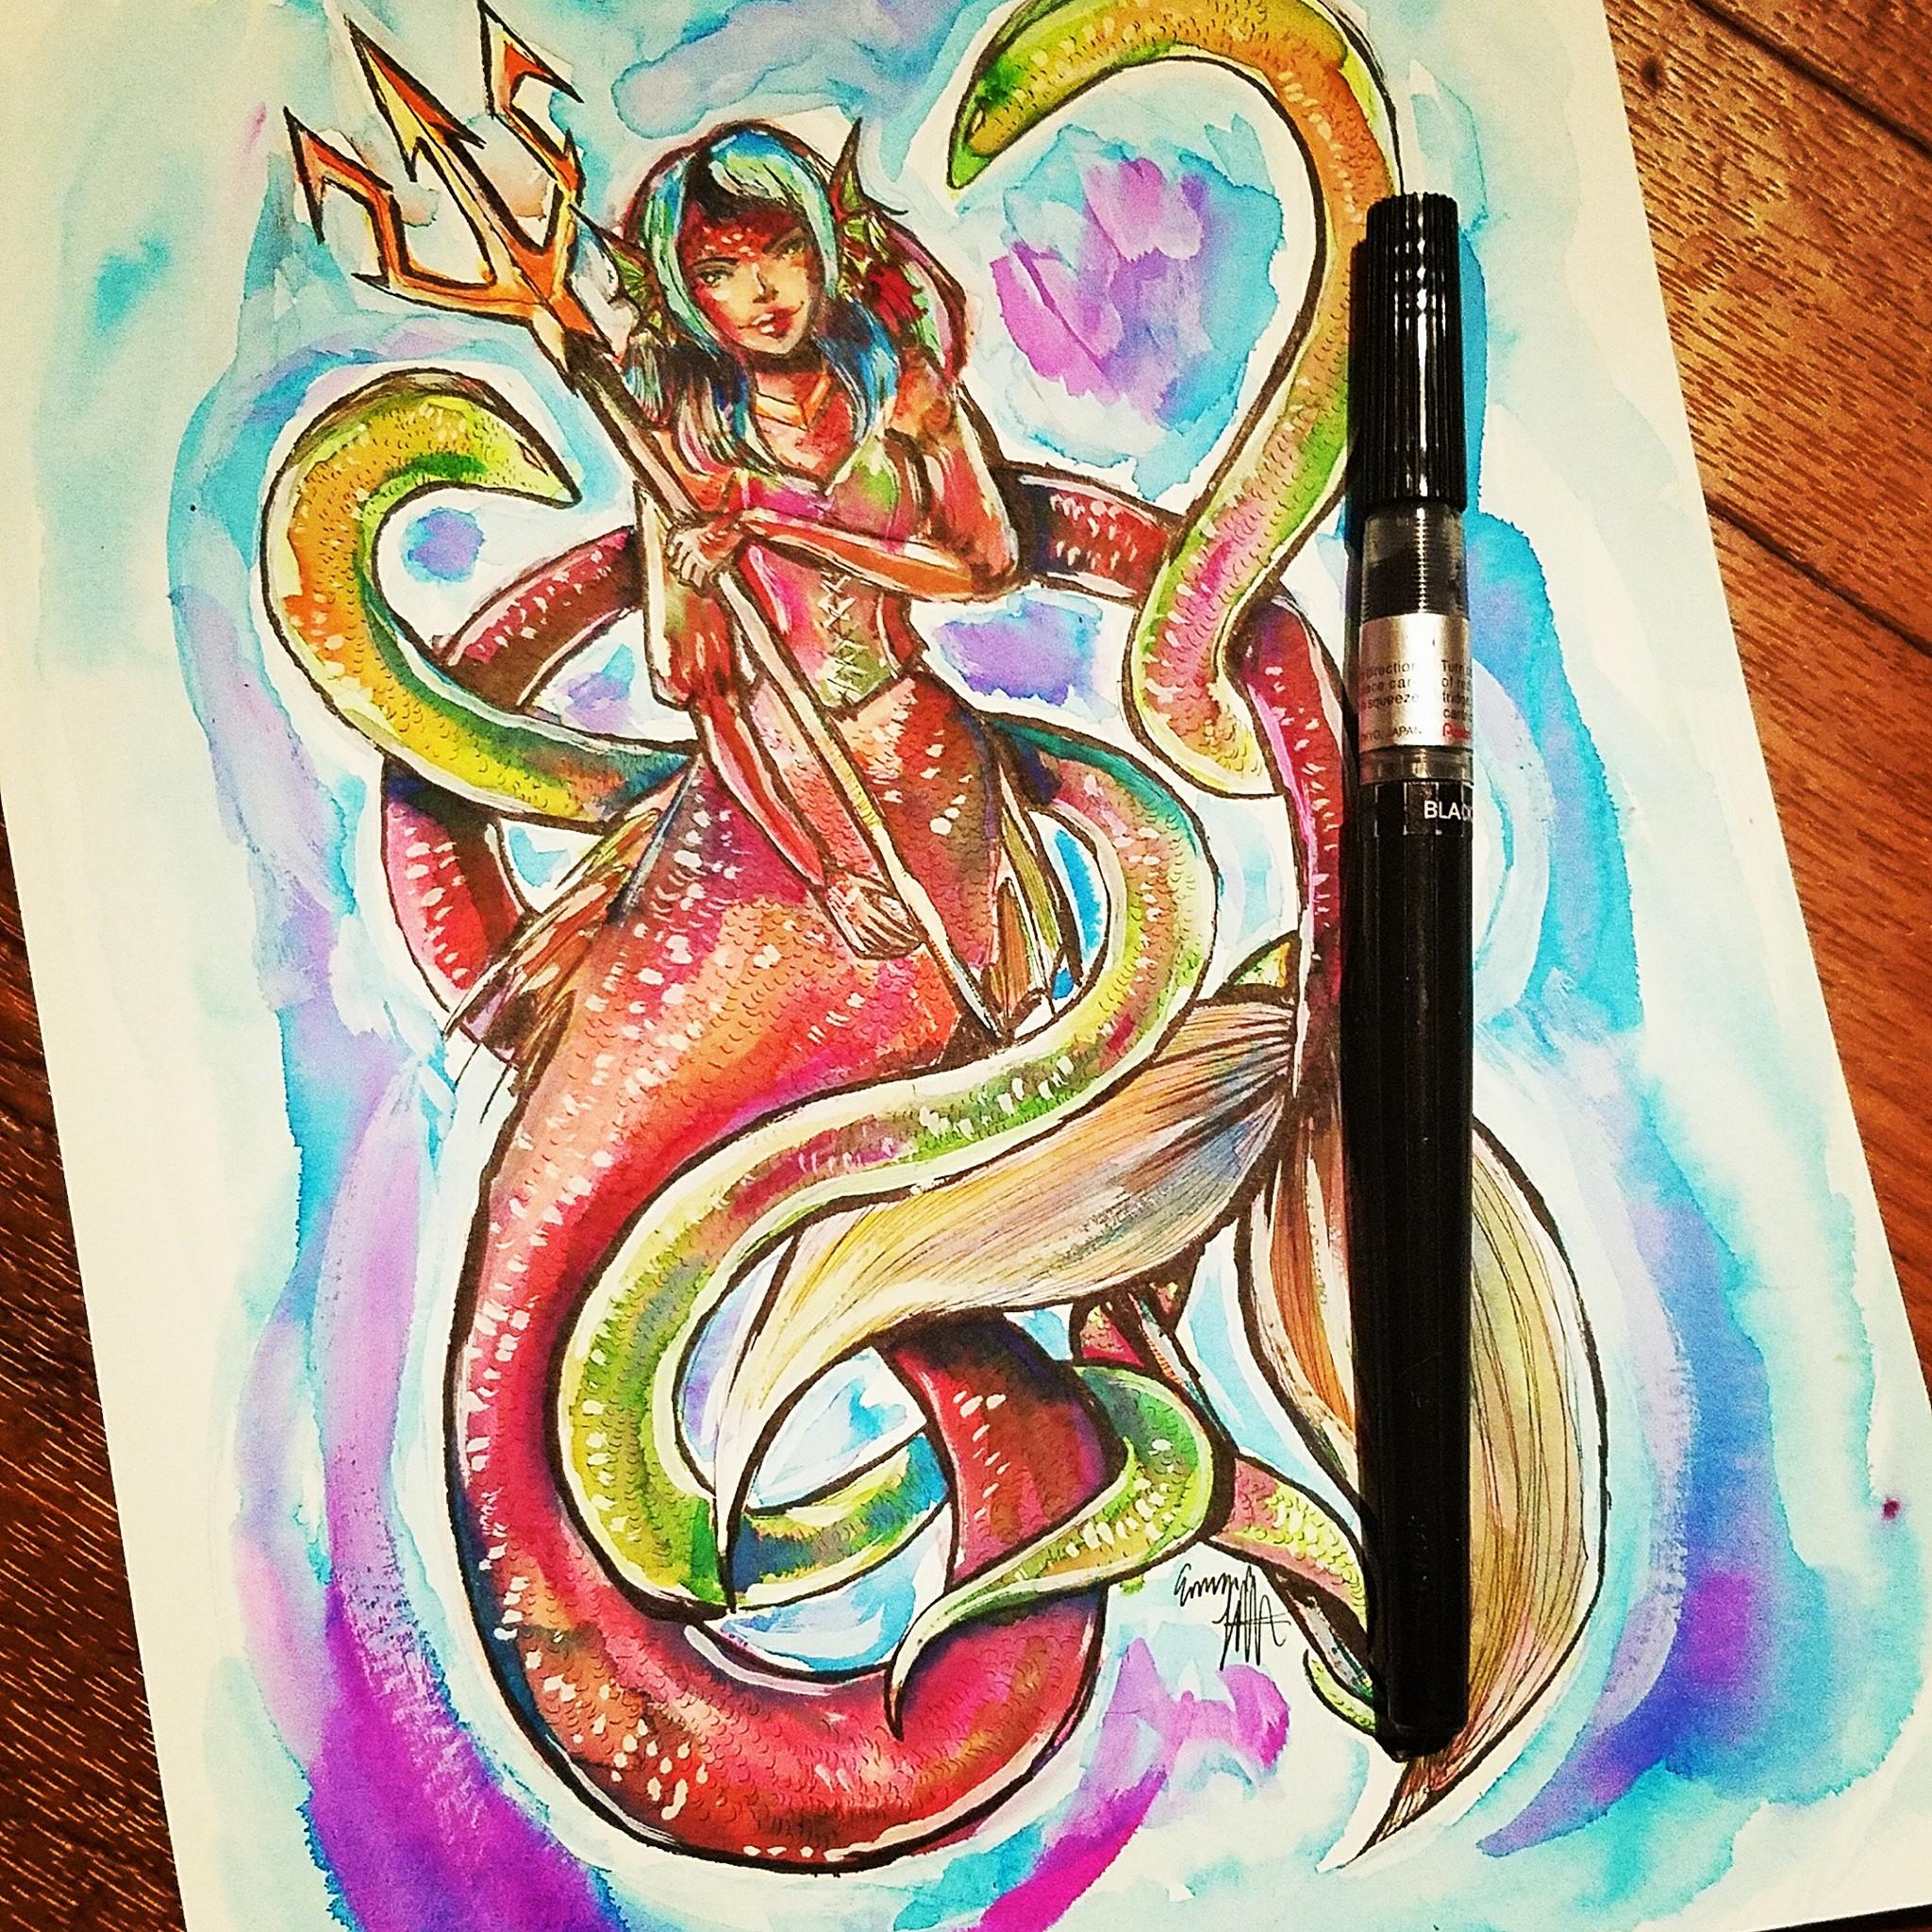 2048x2048 Mermaid Watercolor Painting Discombobble Art Online Store